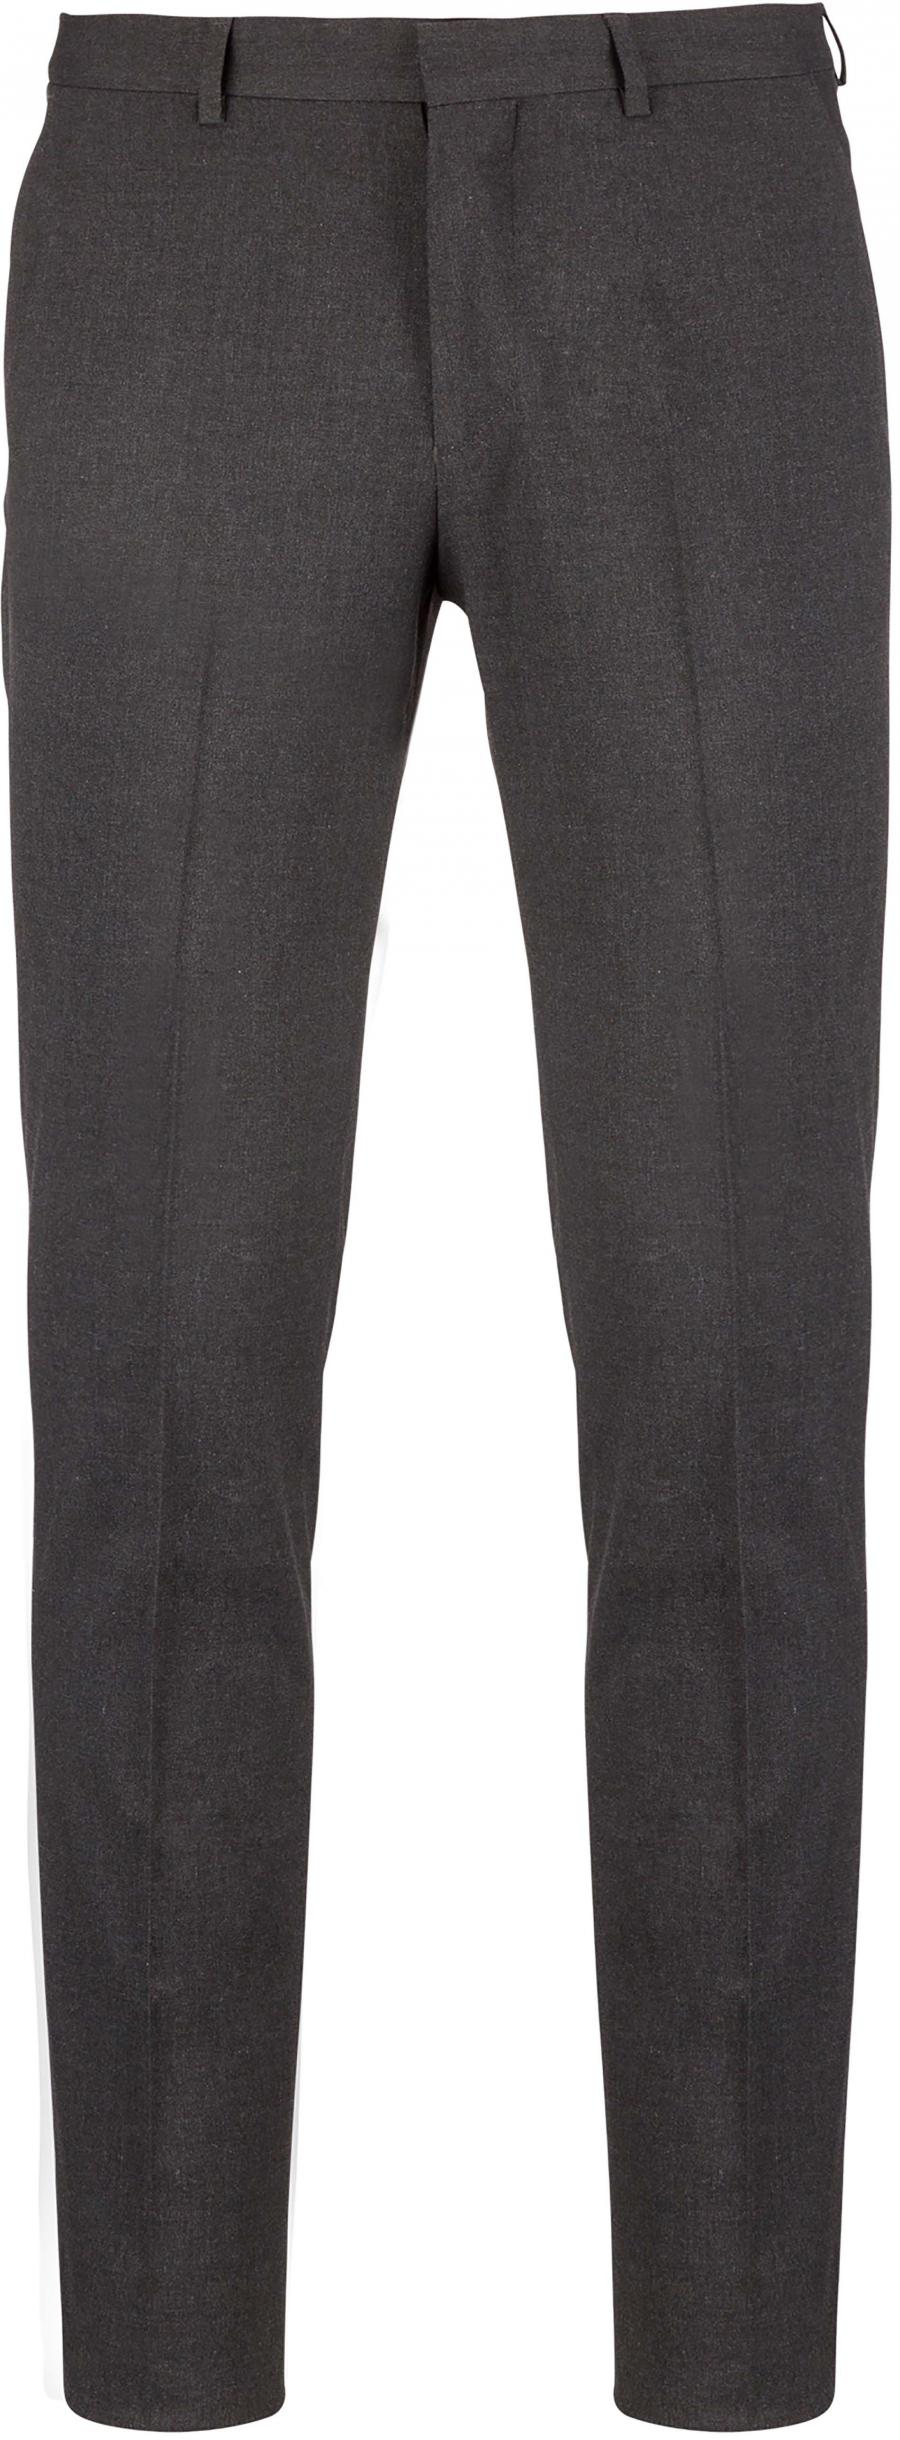 Pantalon homme - 2-1491-5